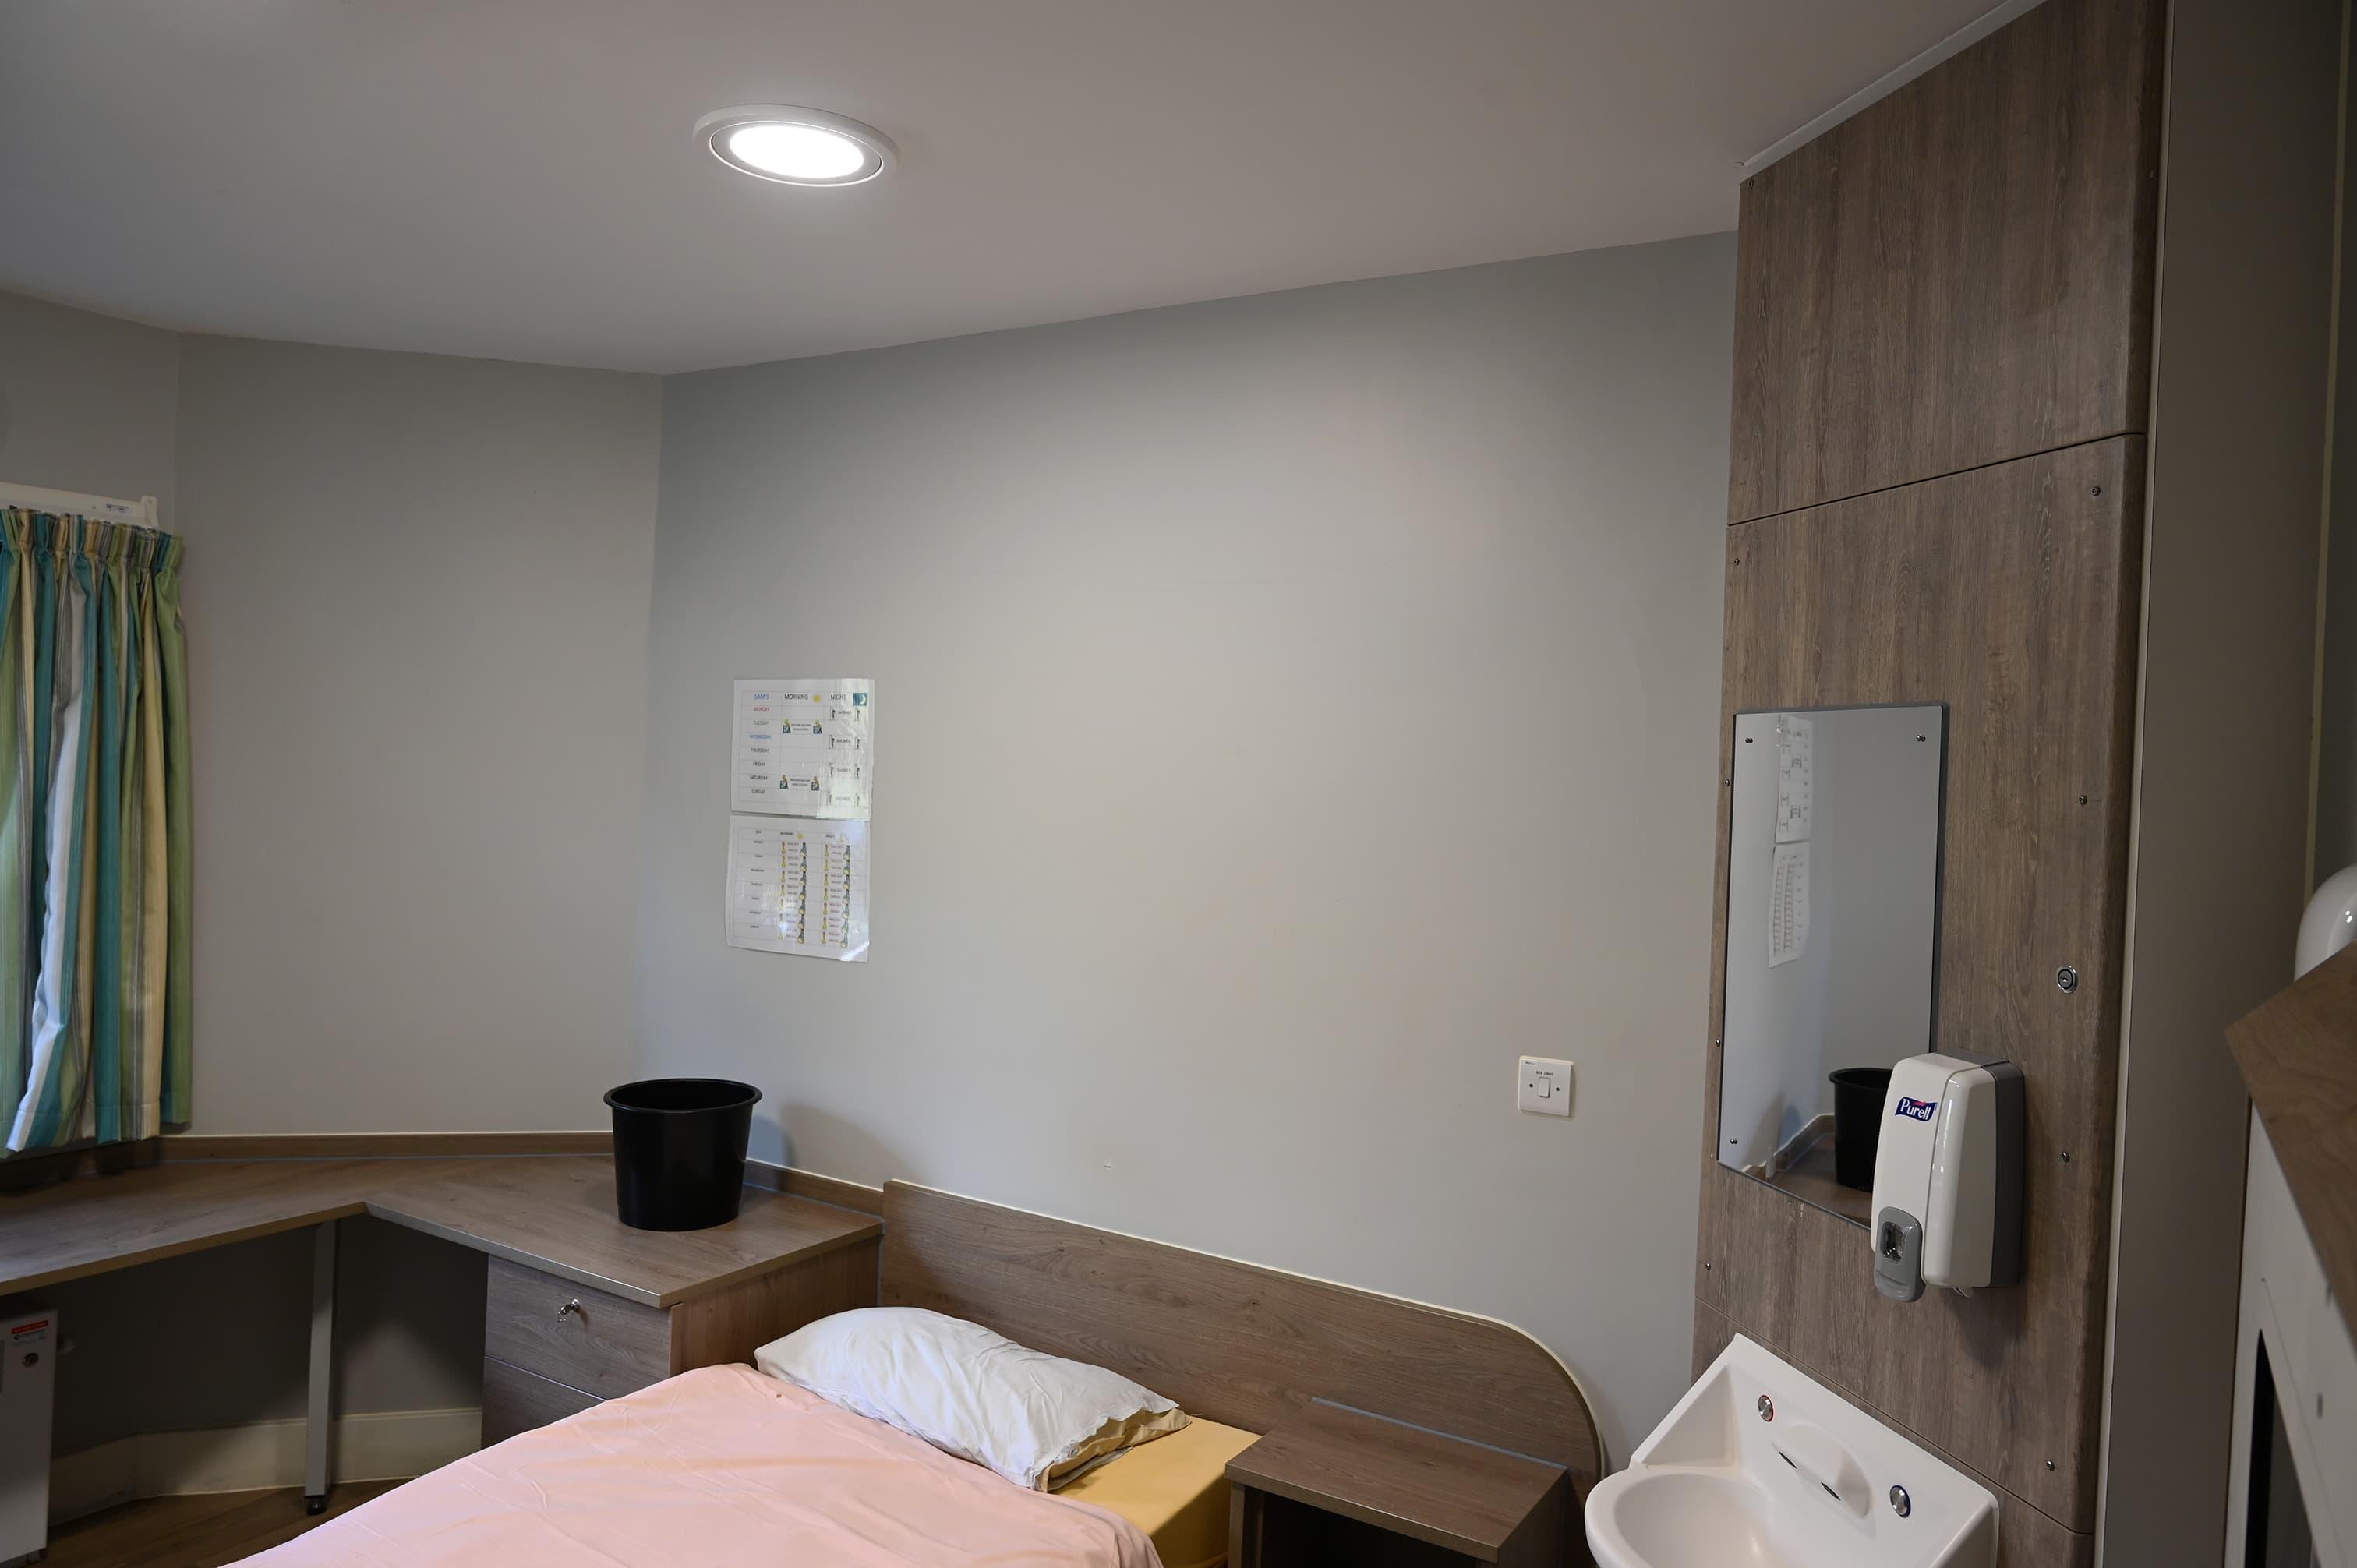 Prestwich Hospital - Bedroom